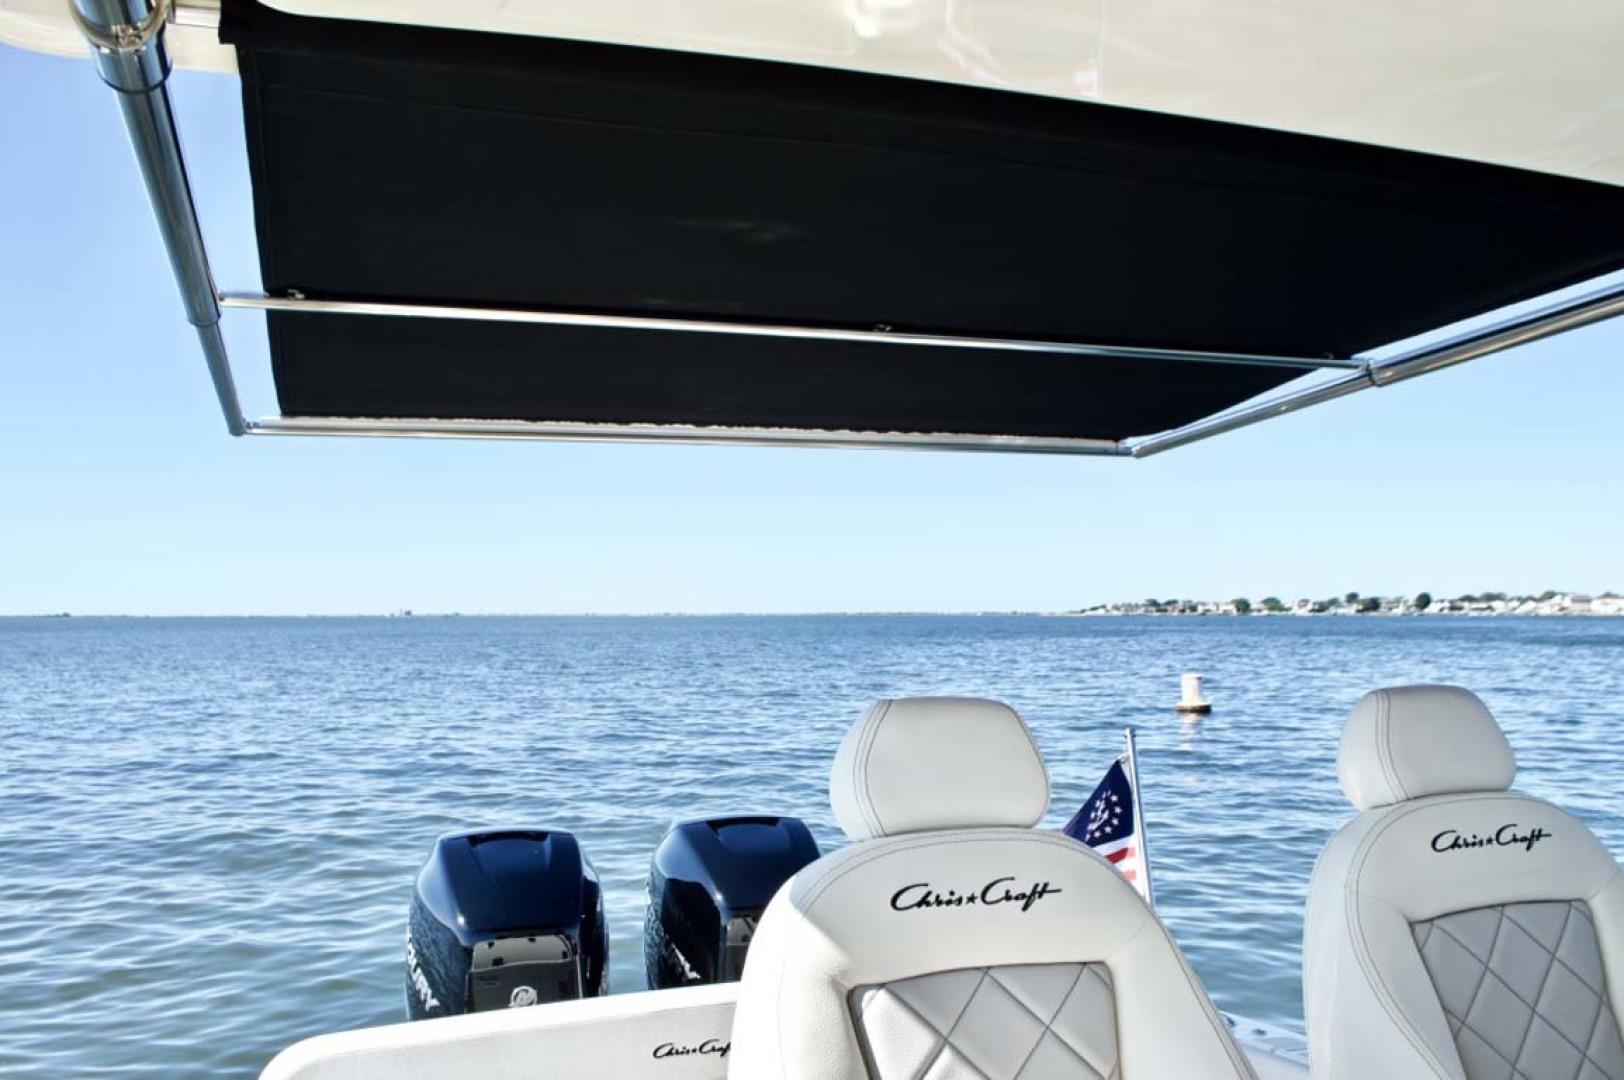 Chris-Craft-30 Catalina 2018-Blue Waters Long Island-New York-United States-Sunshade-1228951   Thumbnail